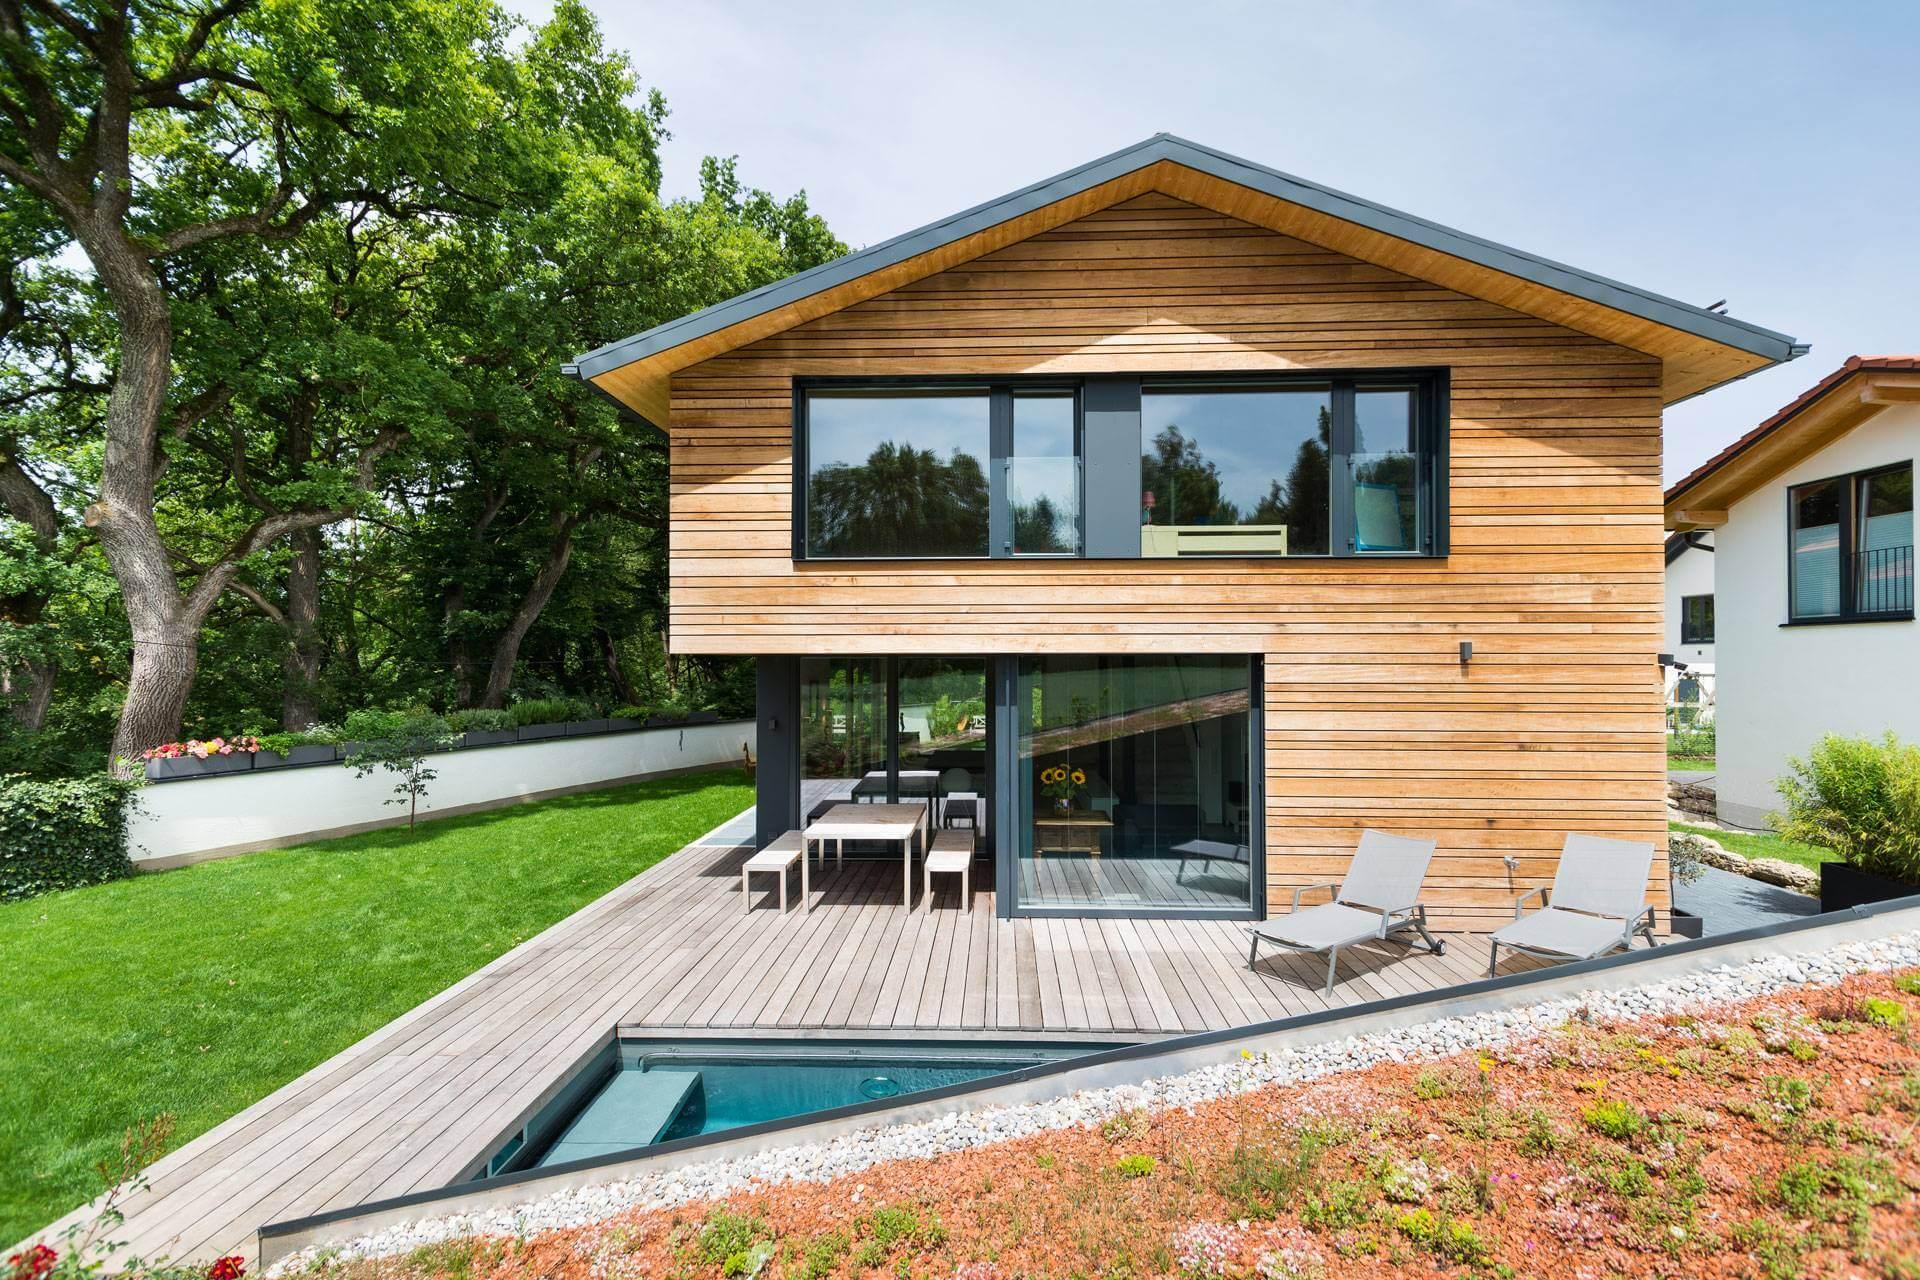 modern-house-despang-schlpmann-architekten-04